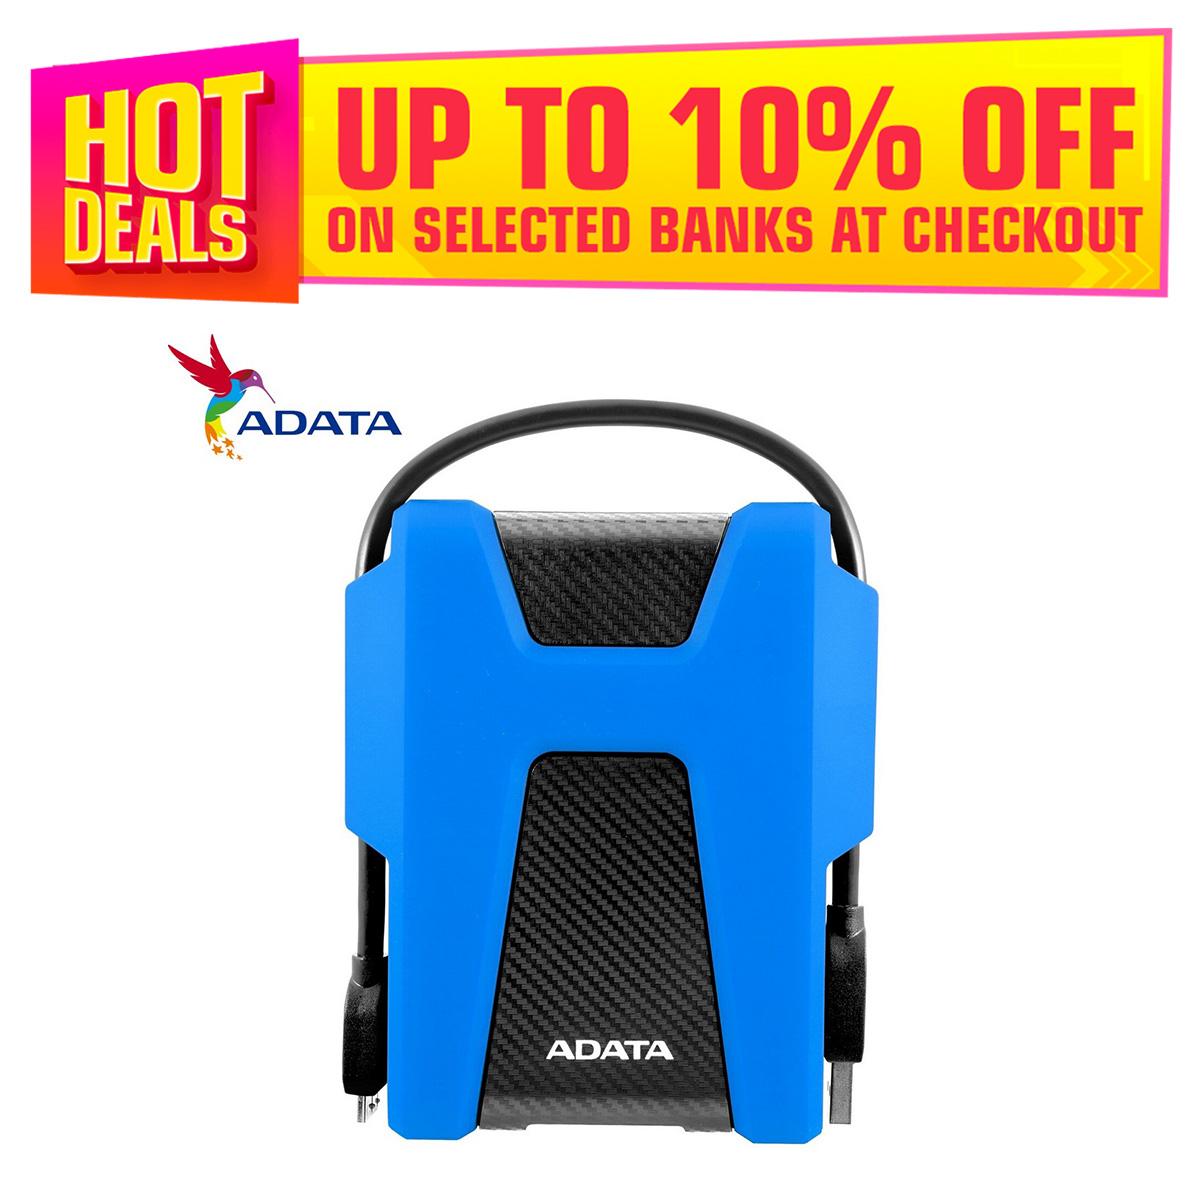 ADATA 1TB HD680 USB 3.2 Gen1 Military-Grade Shock-Proof External Portable Hard Drive Blue